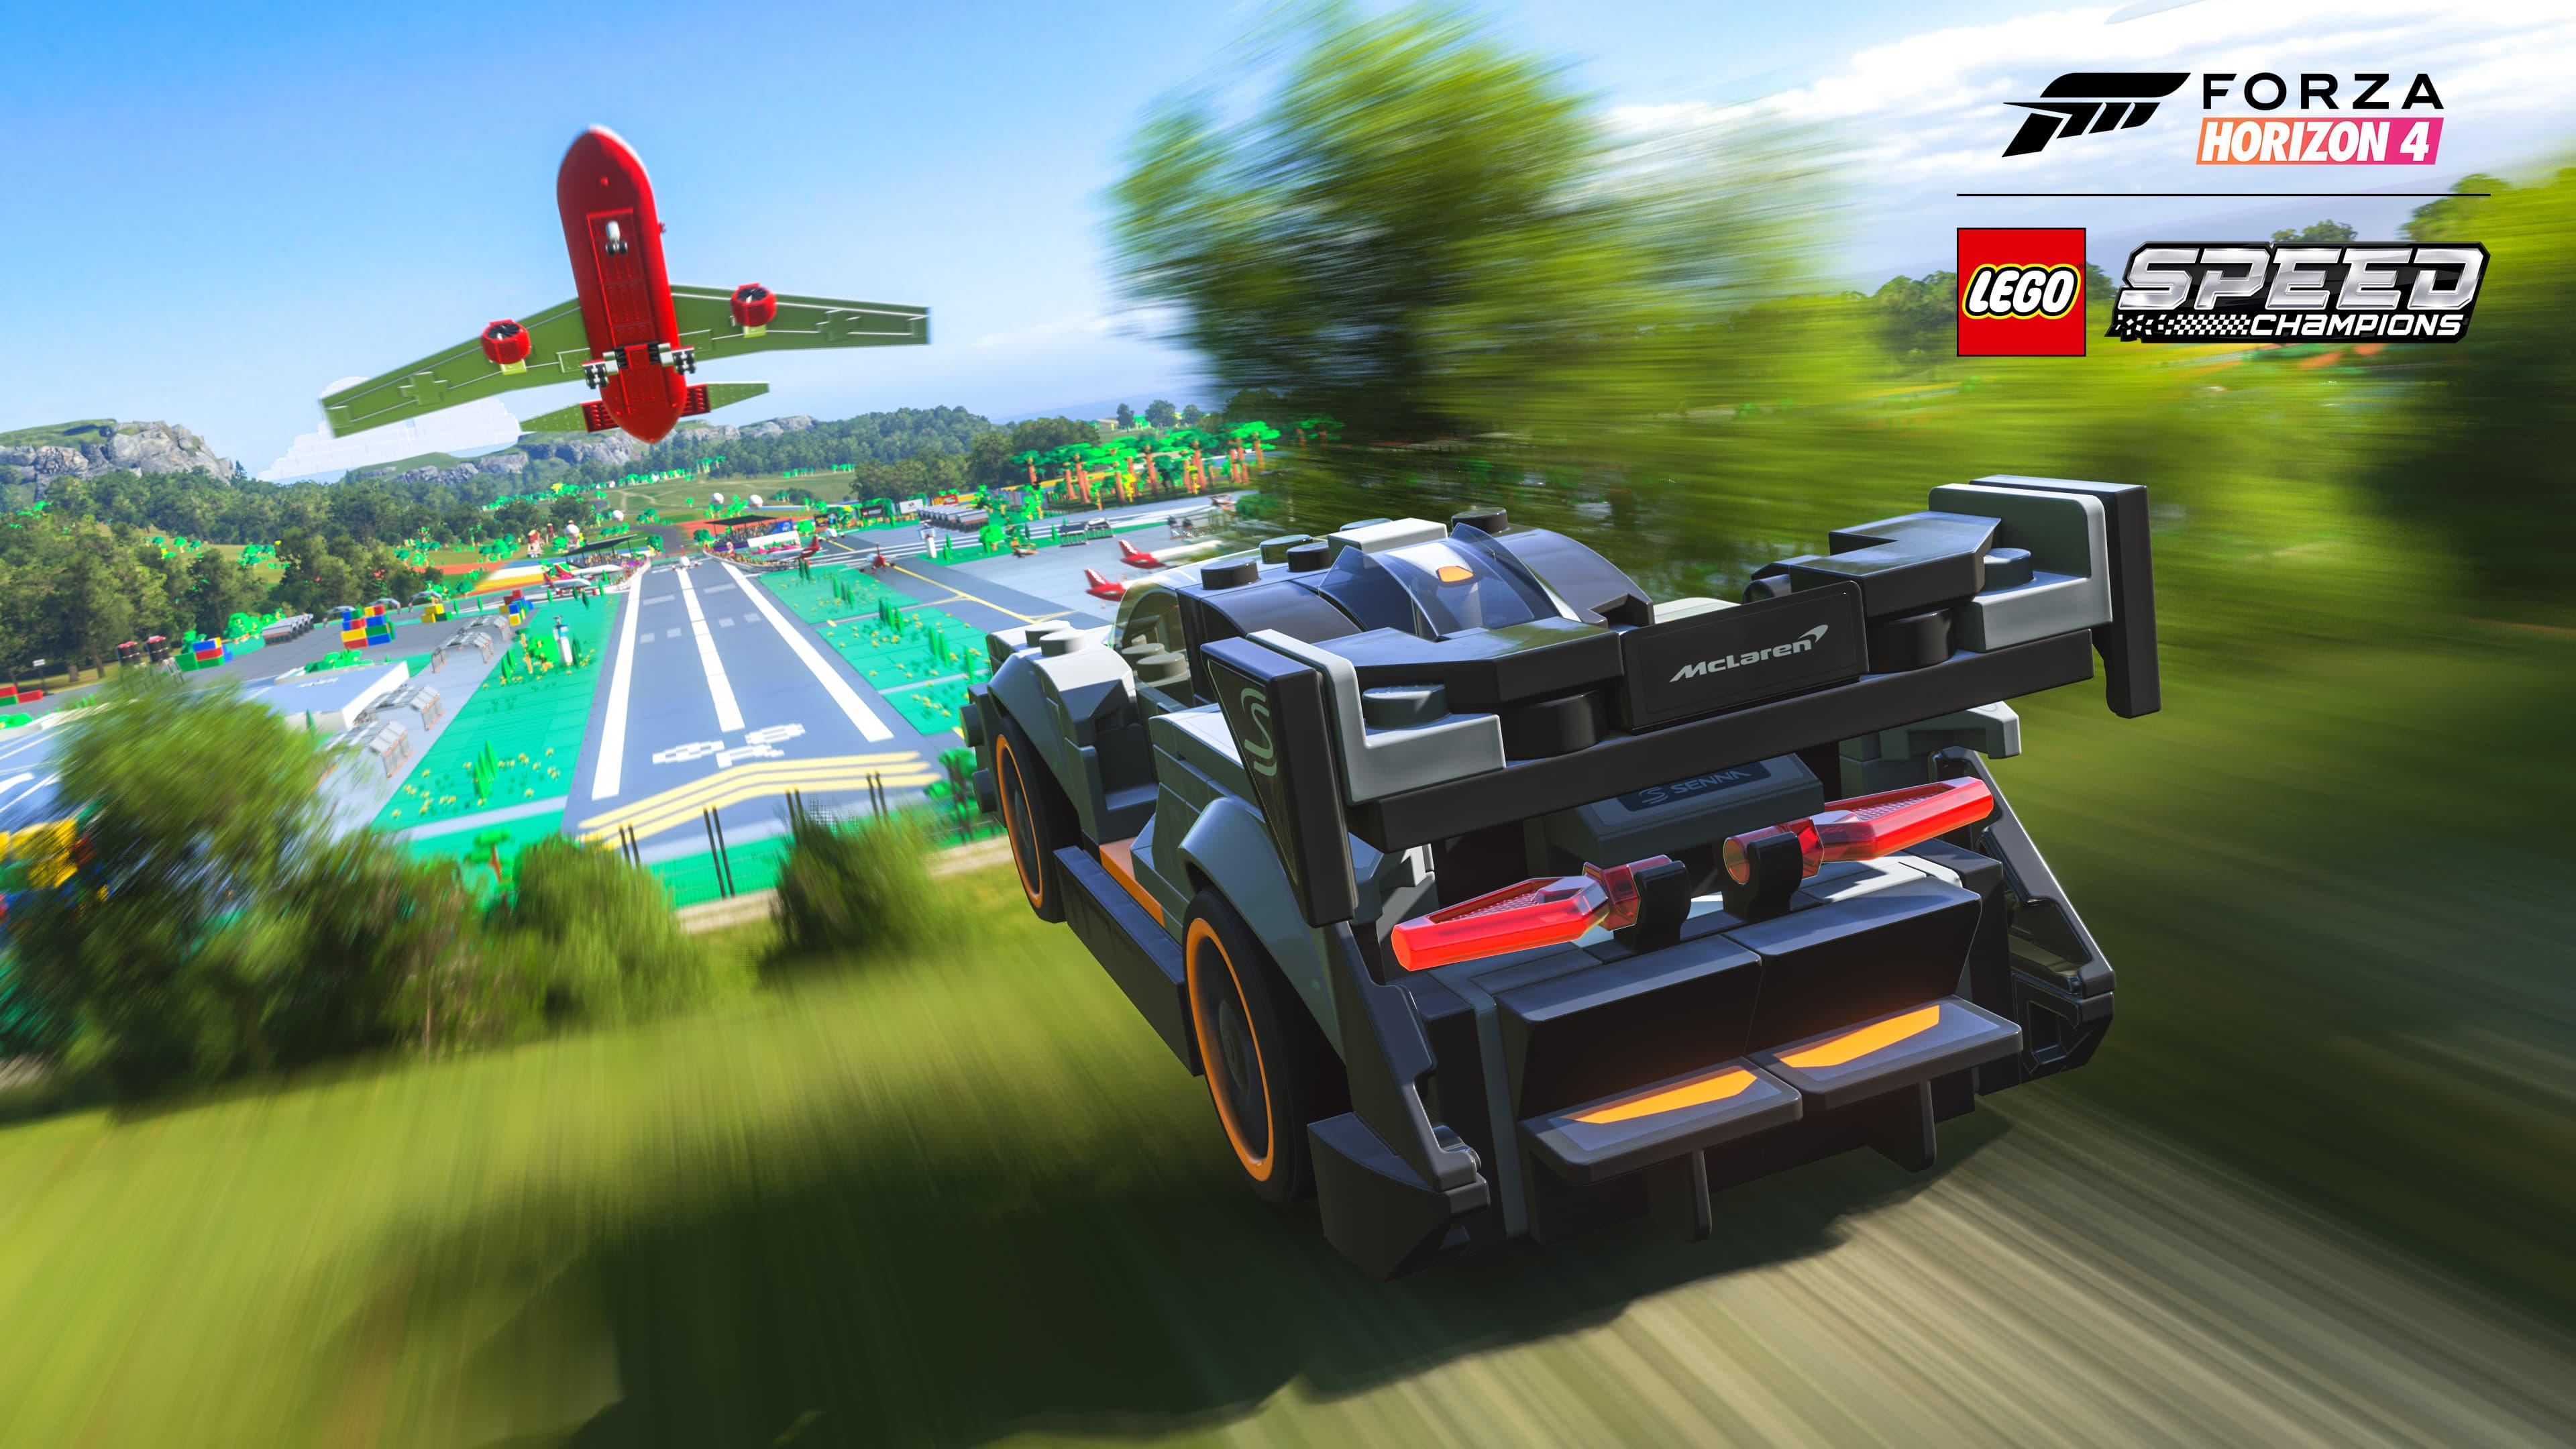 Forza Horizon 4: LEGO Speed Champions Xbox